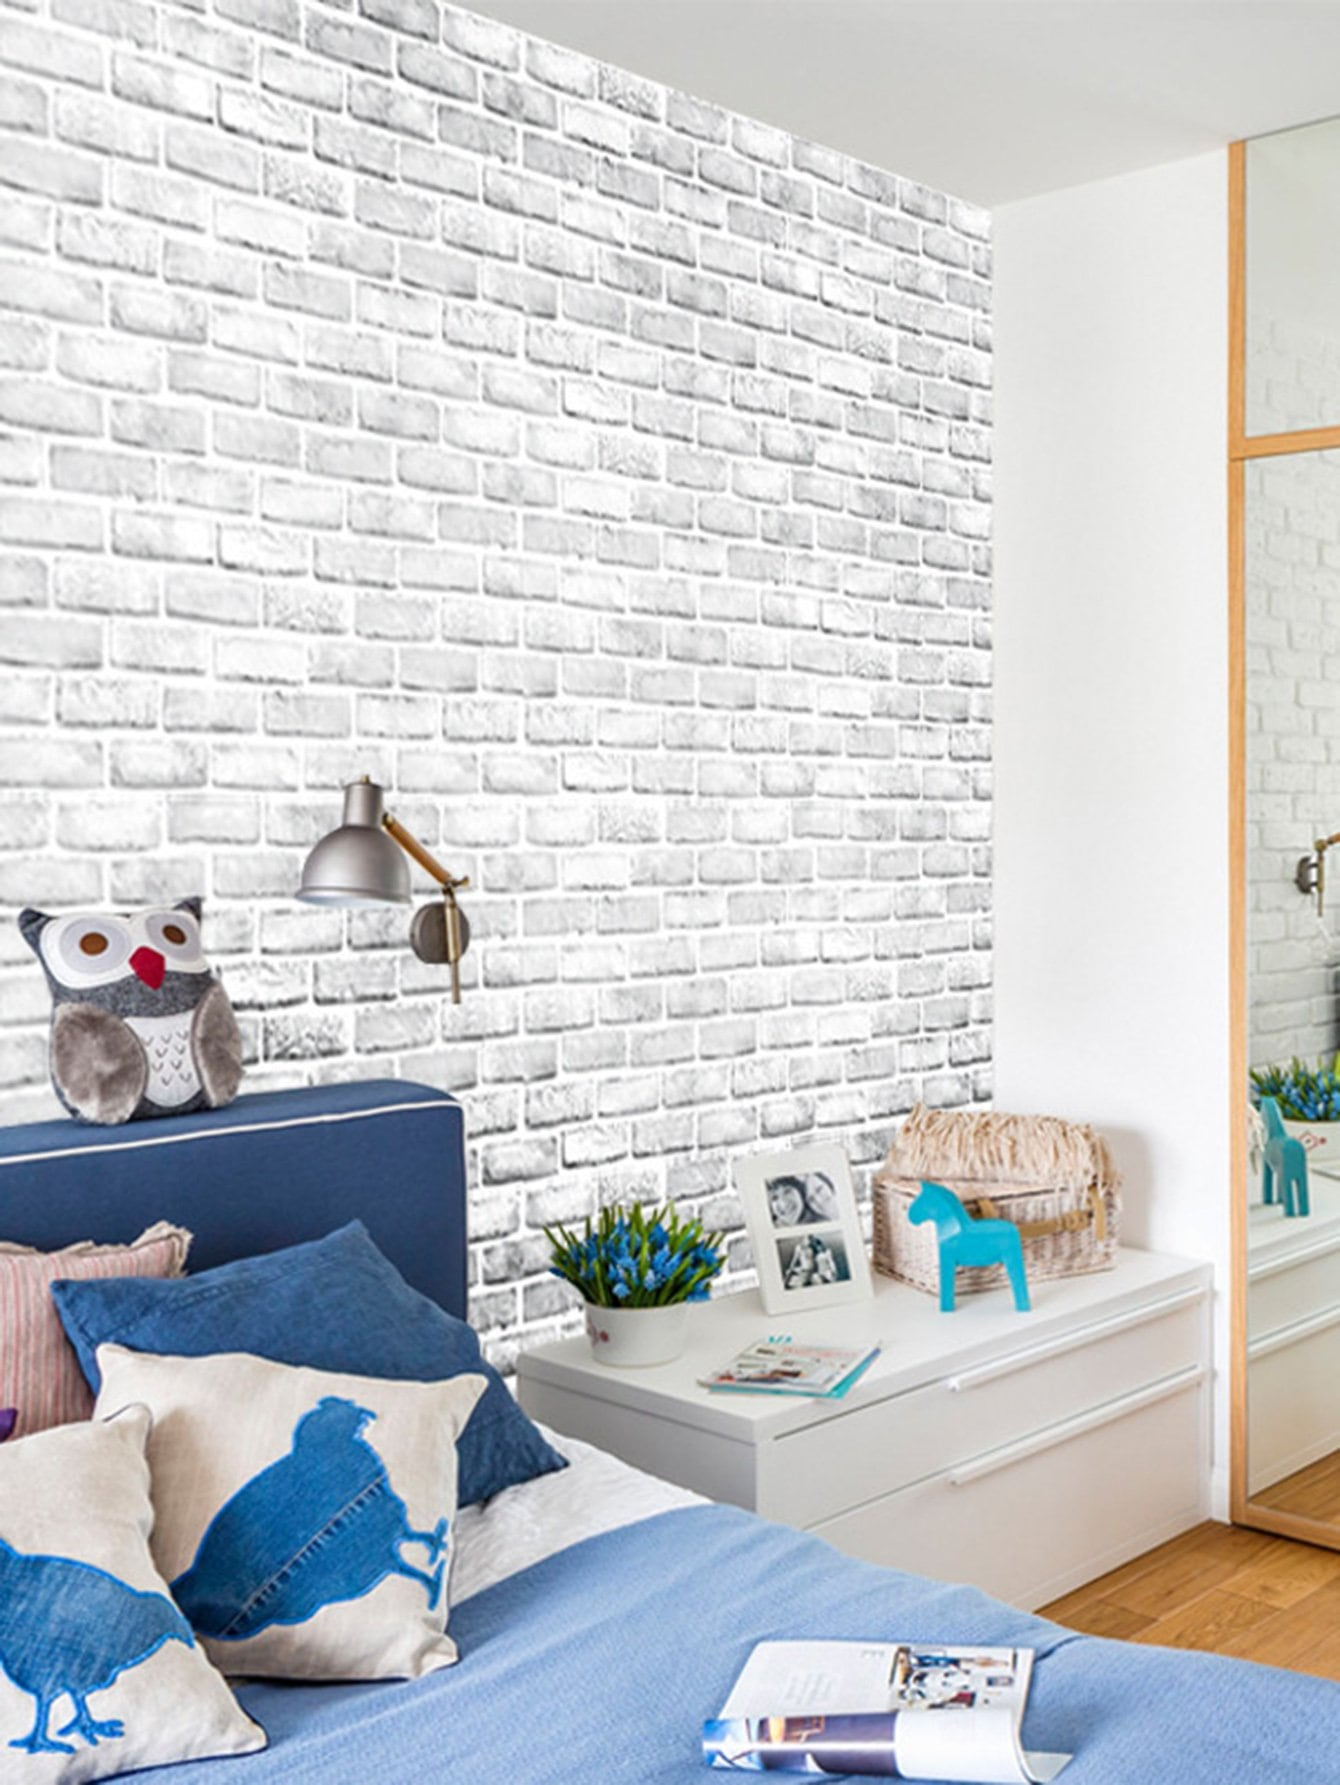 3D Self-adhesive Brick Wall Sticker